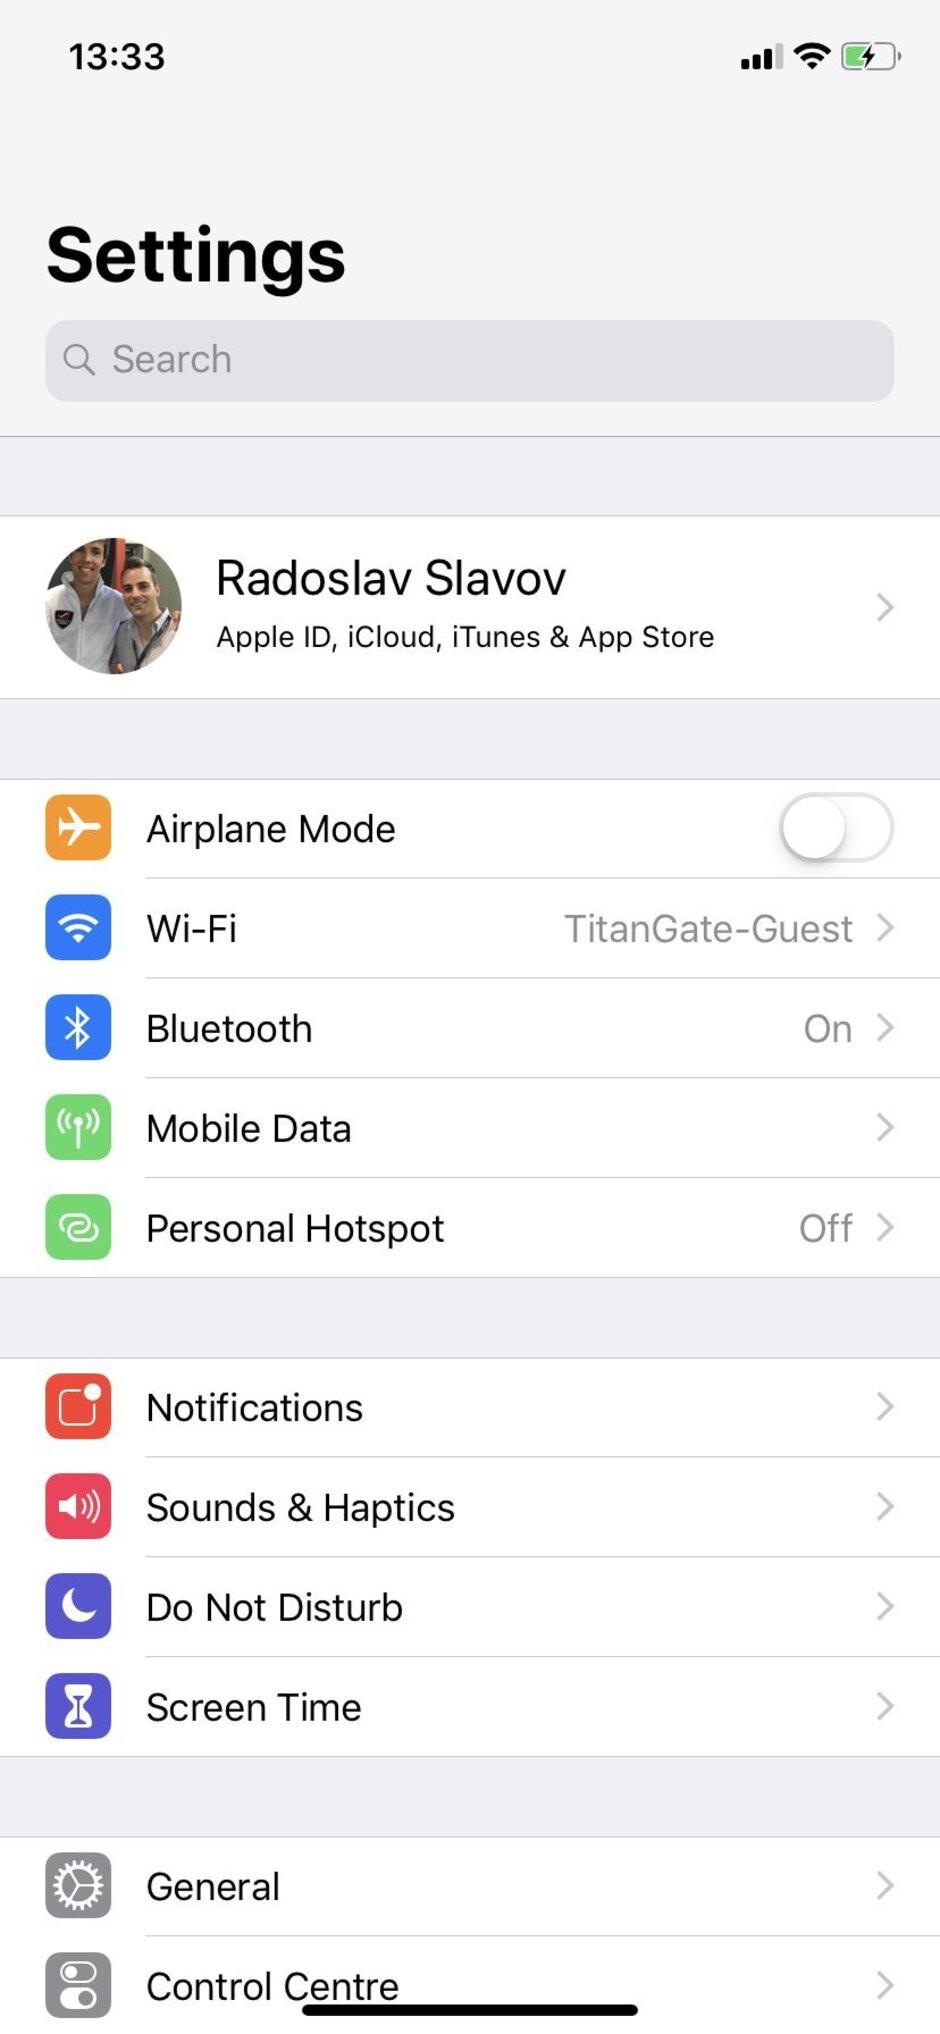 UI of the iPhone XR - Samsung Galaxy S10e vs Apple iPhone XR